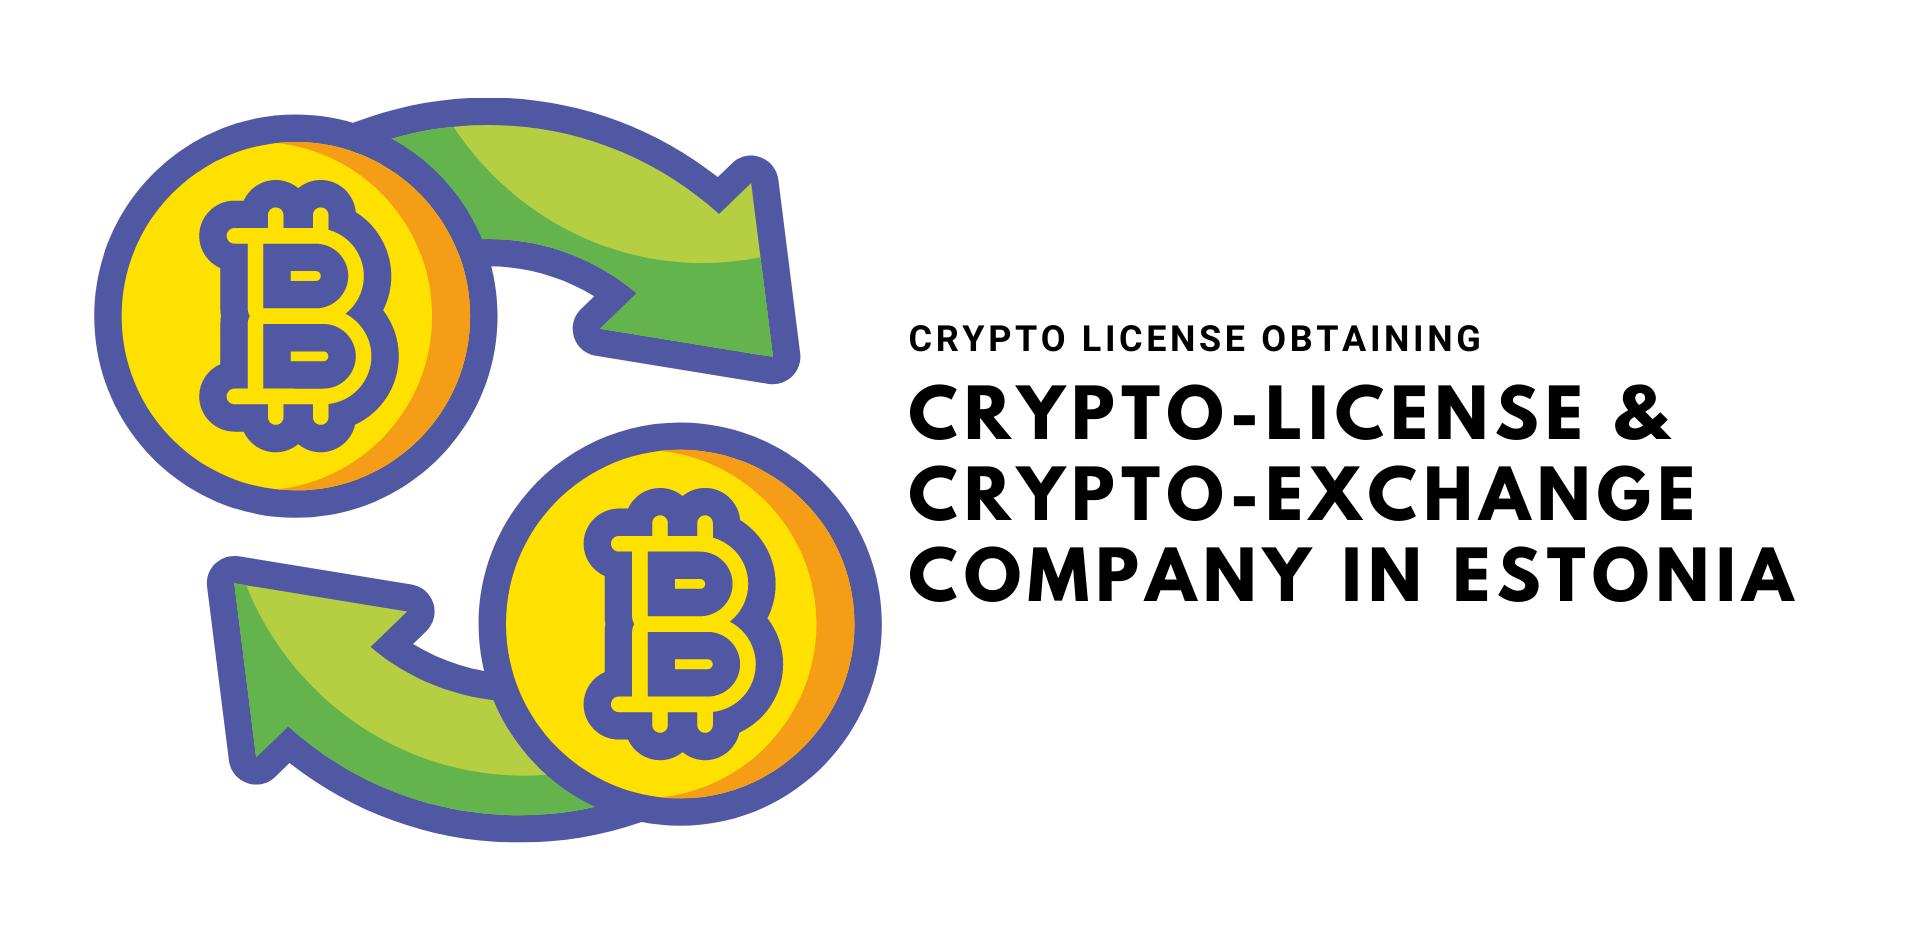 cryptocurrency exchange company